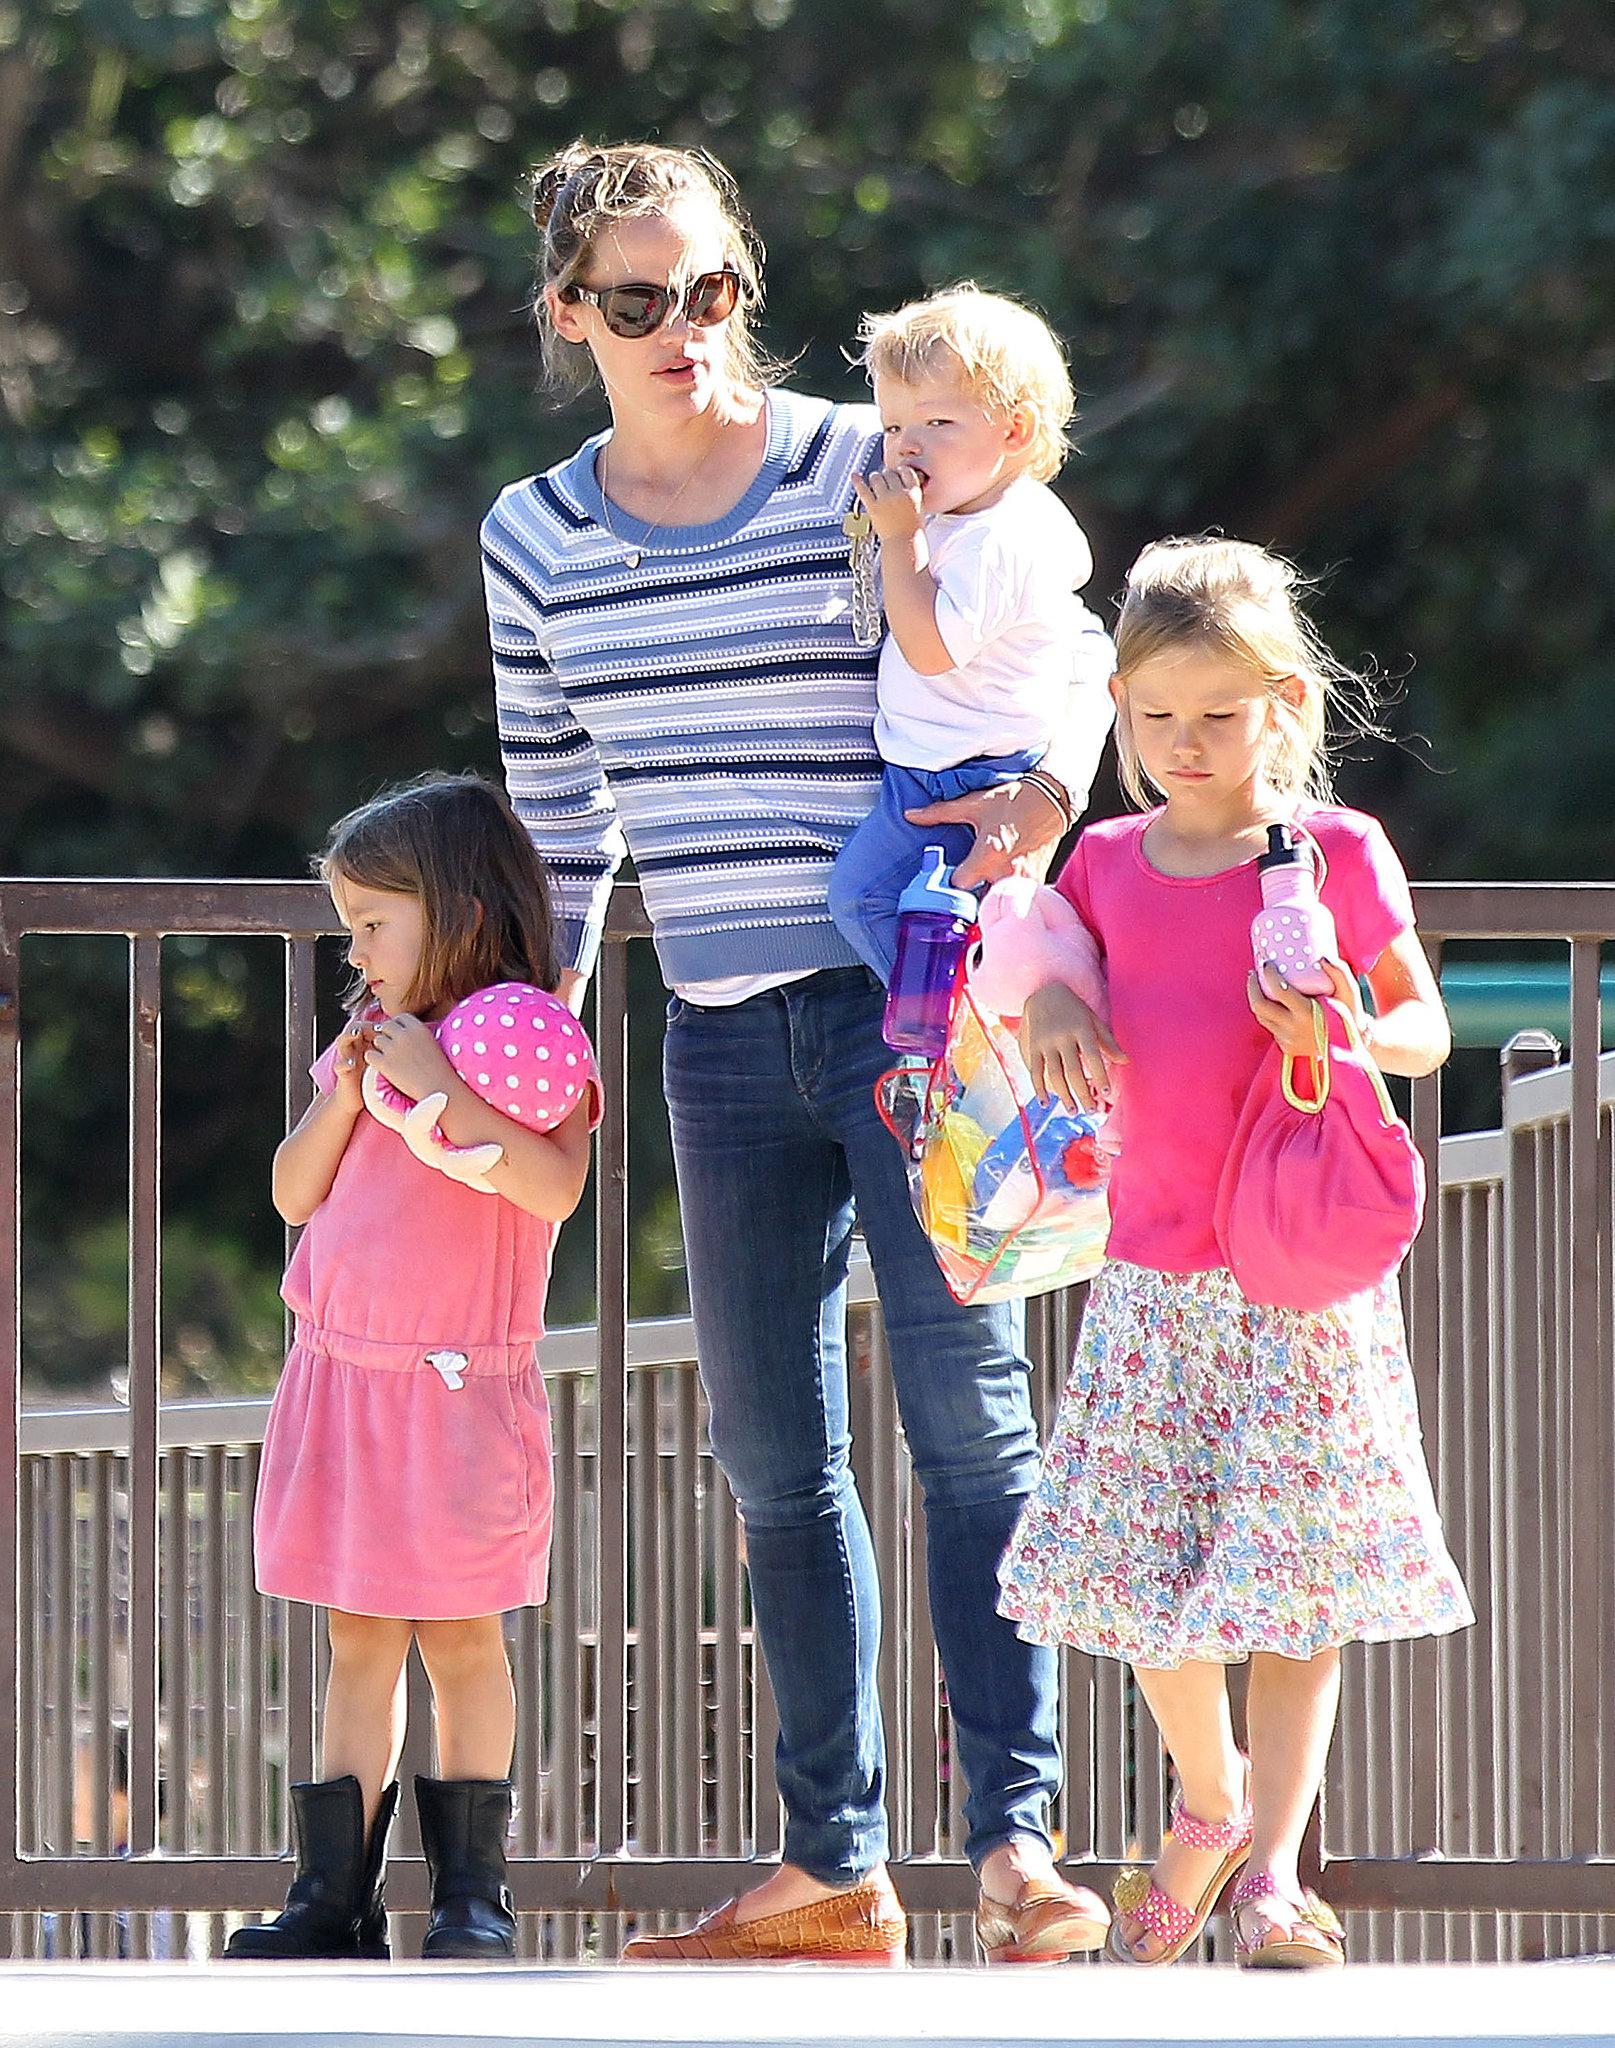 Jennifer Garner Has the World's Cutest Playdate With Her Kids